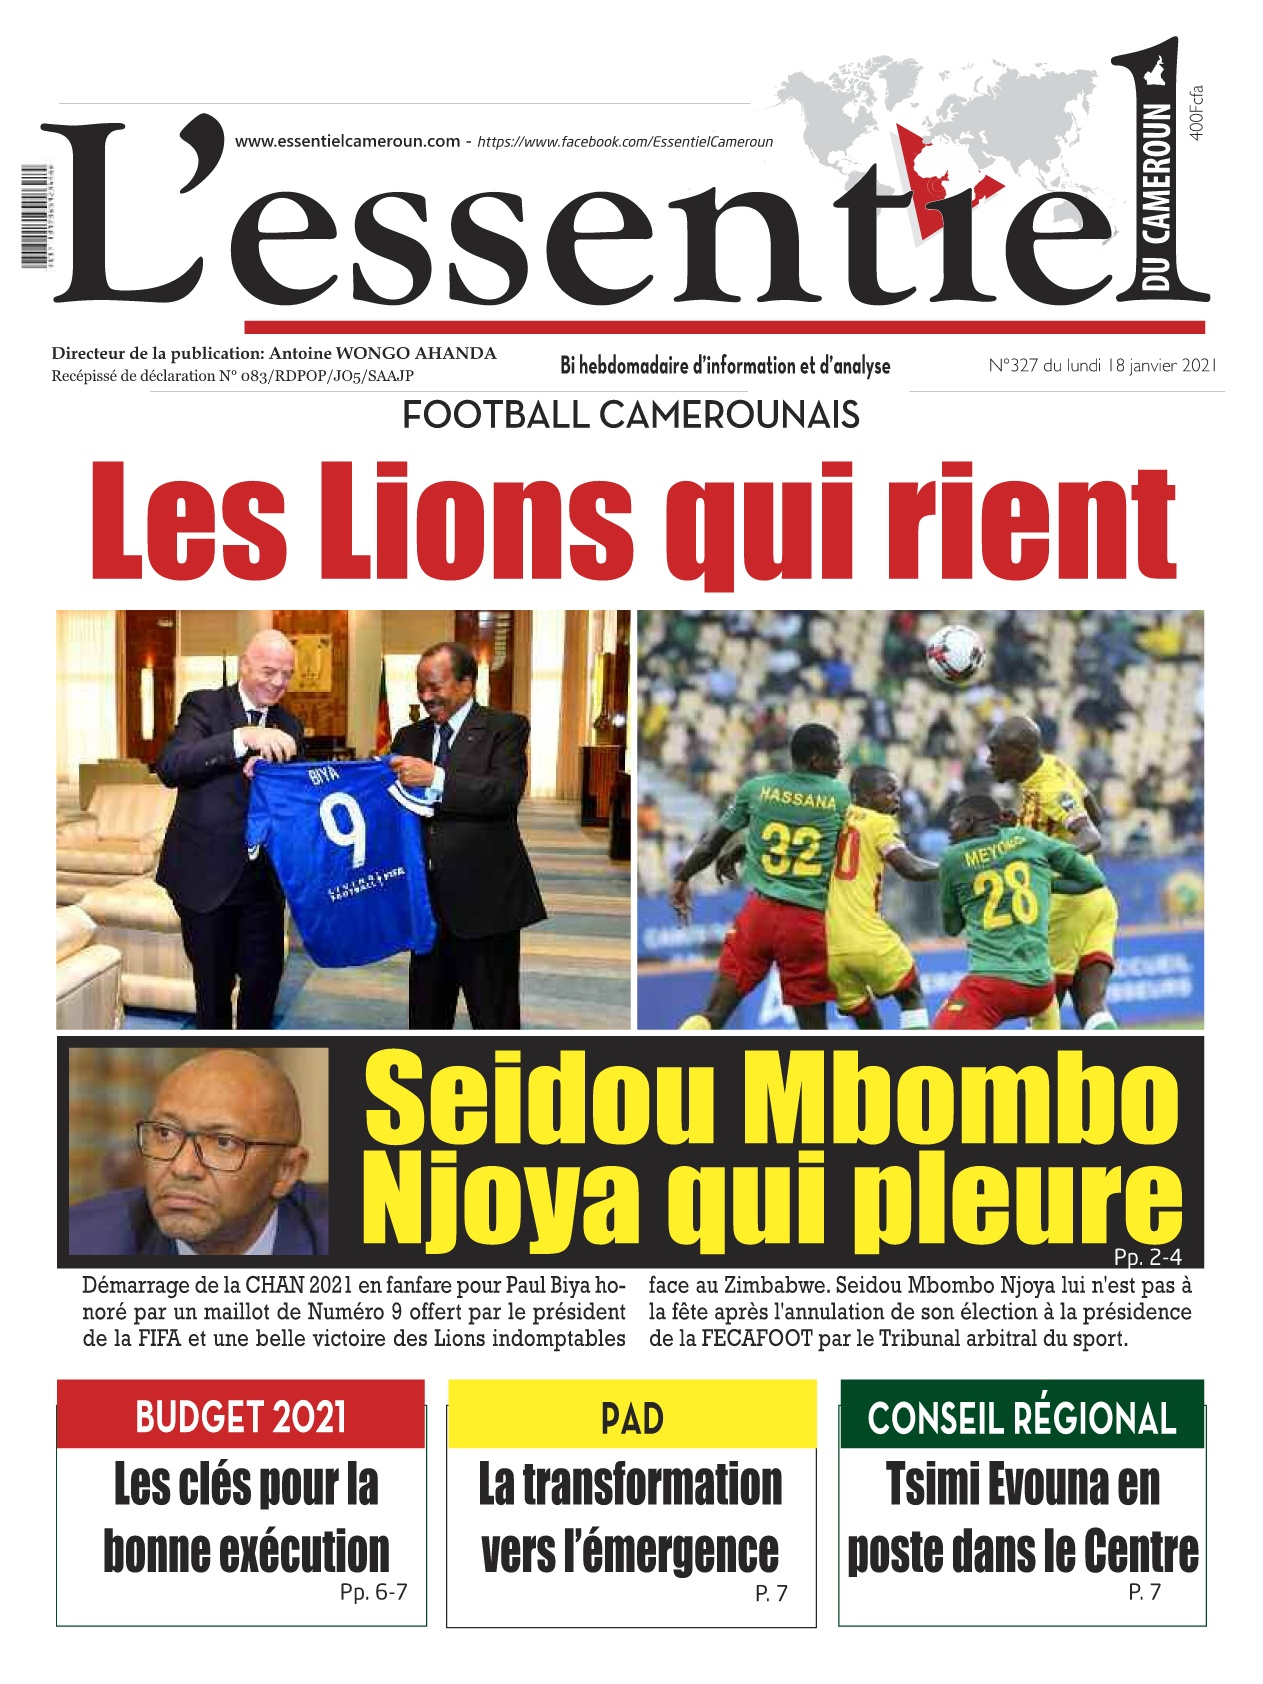 L'essentiel du Cameroun - 18/01/2021